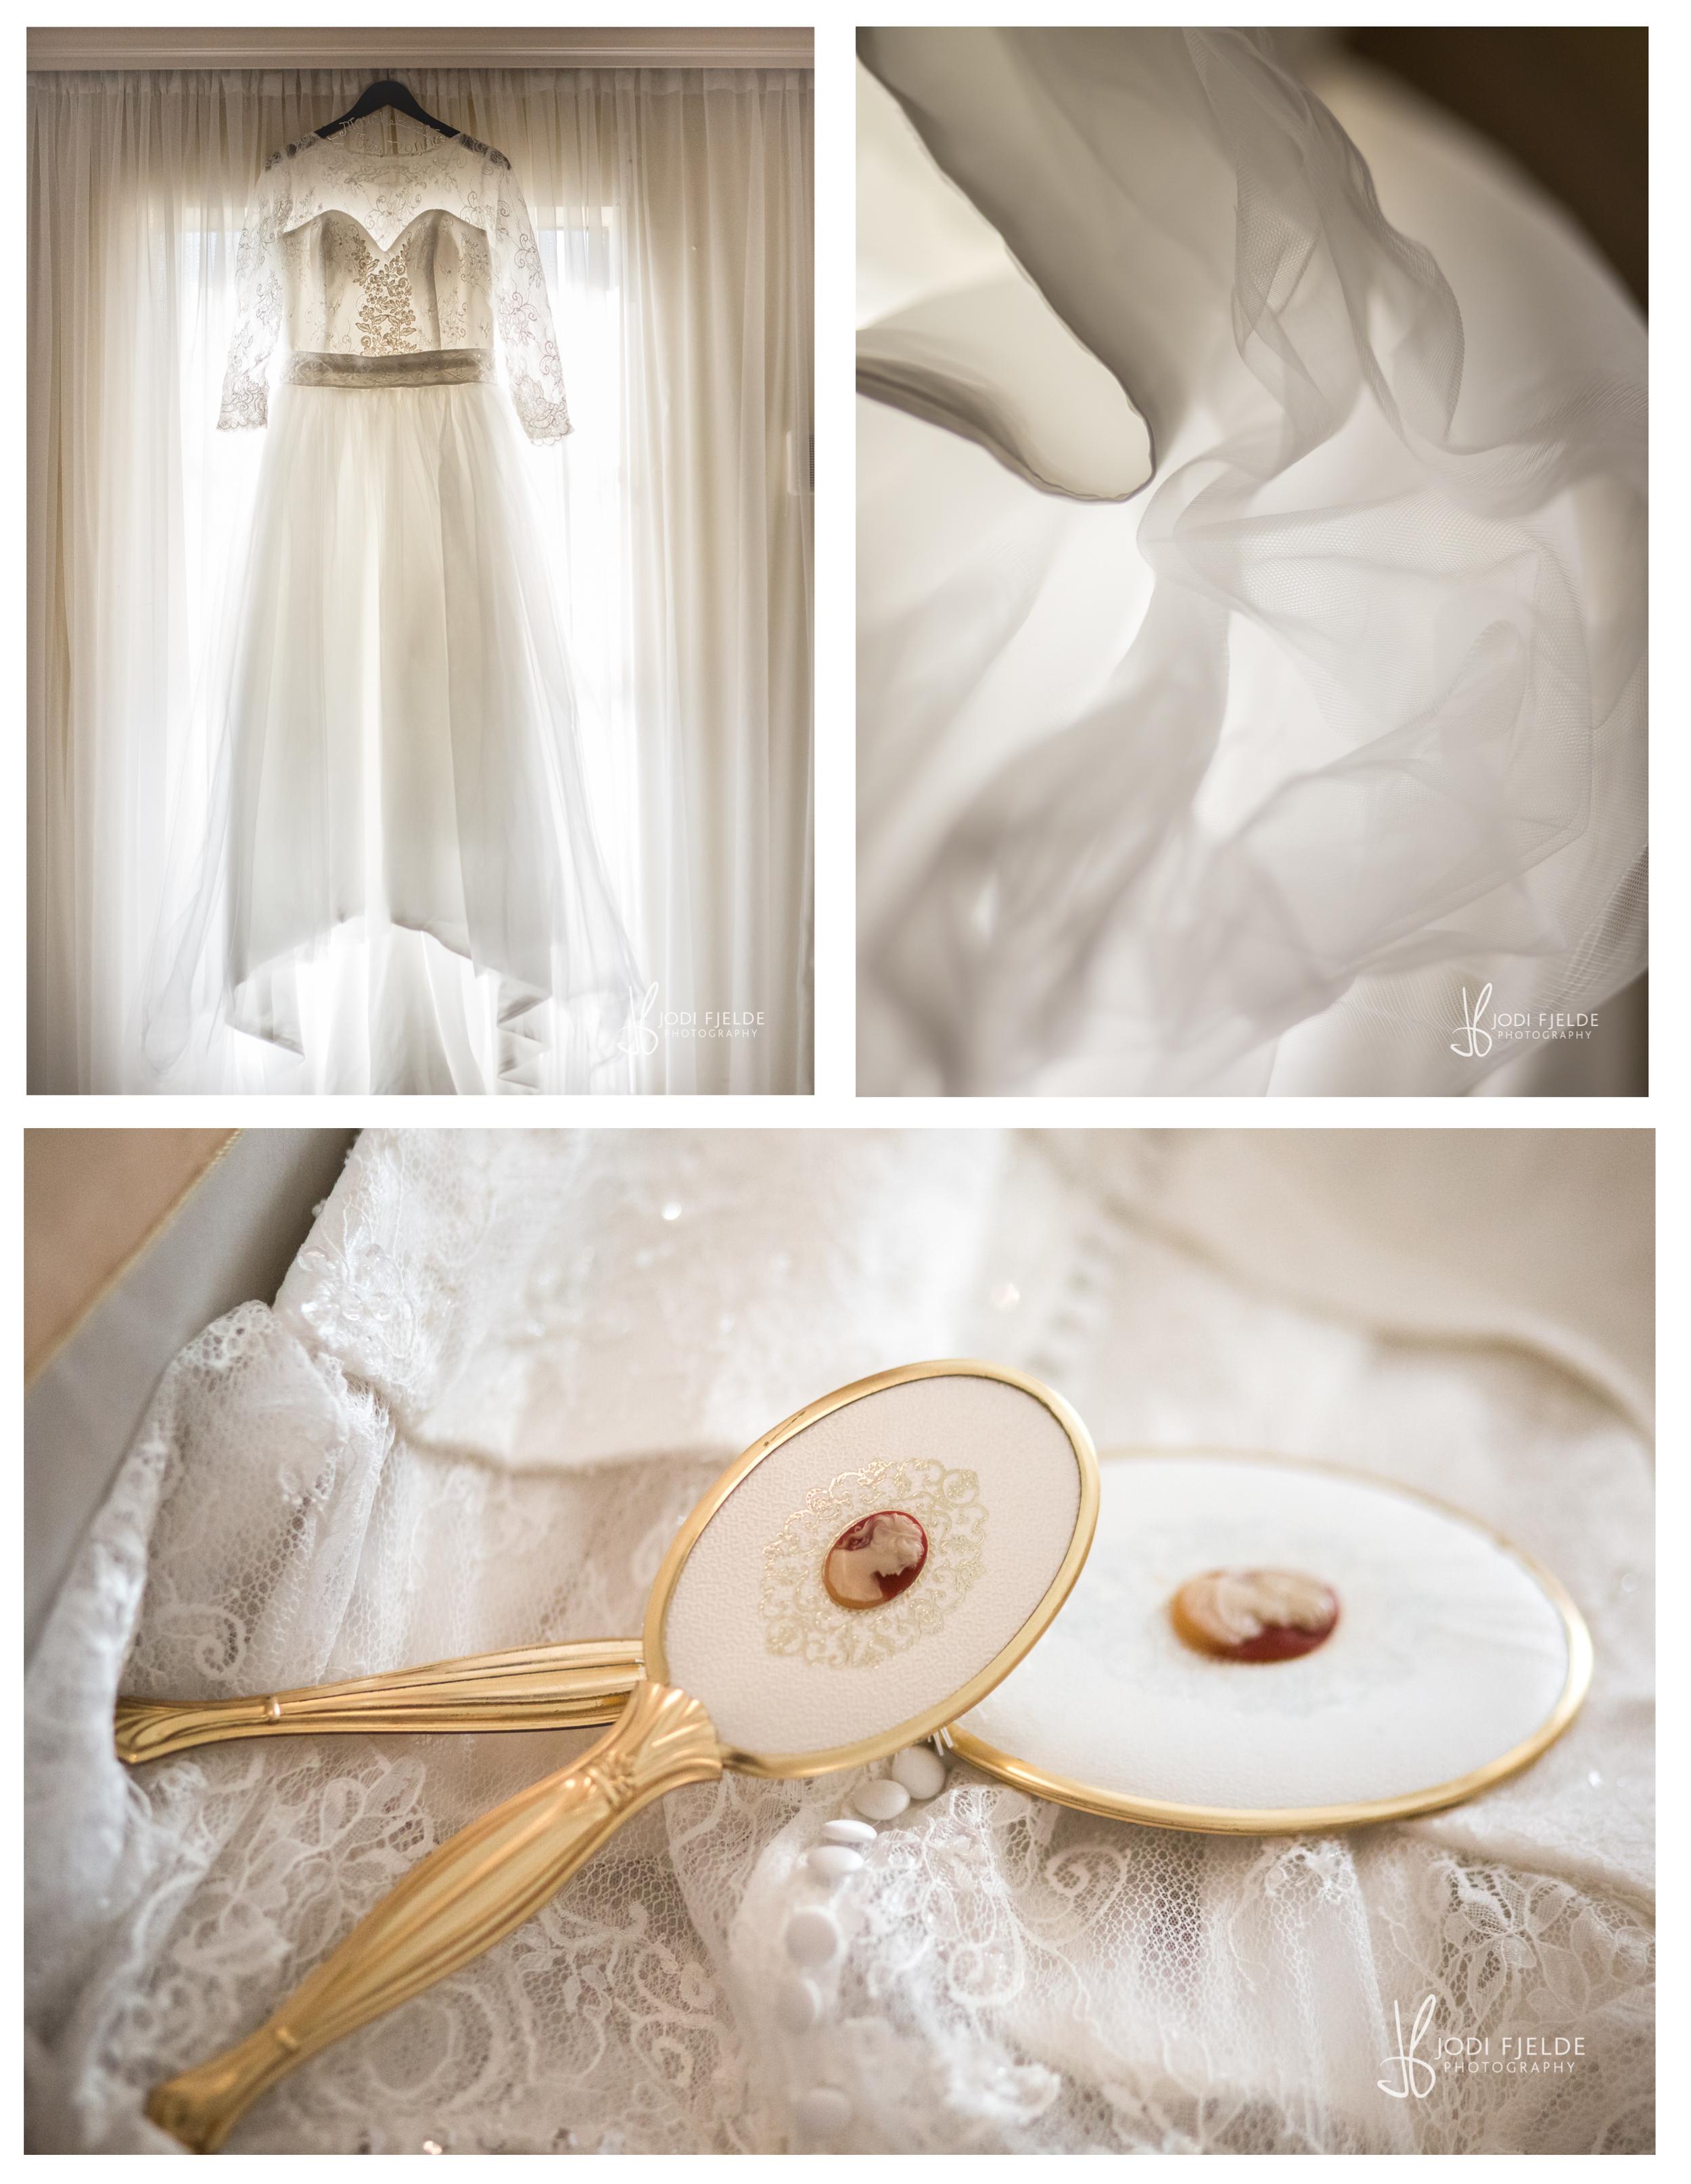 Ballroom Wedding_Ft Lauderdale_Florida_wedding_Maria_&_Juan_photography_jodi_Fjelde_photography-3.jpg